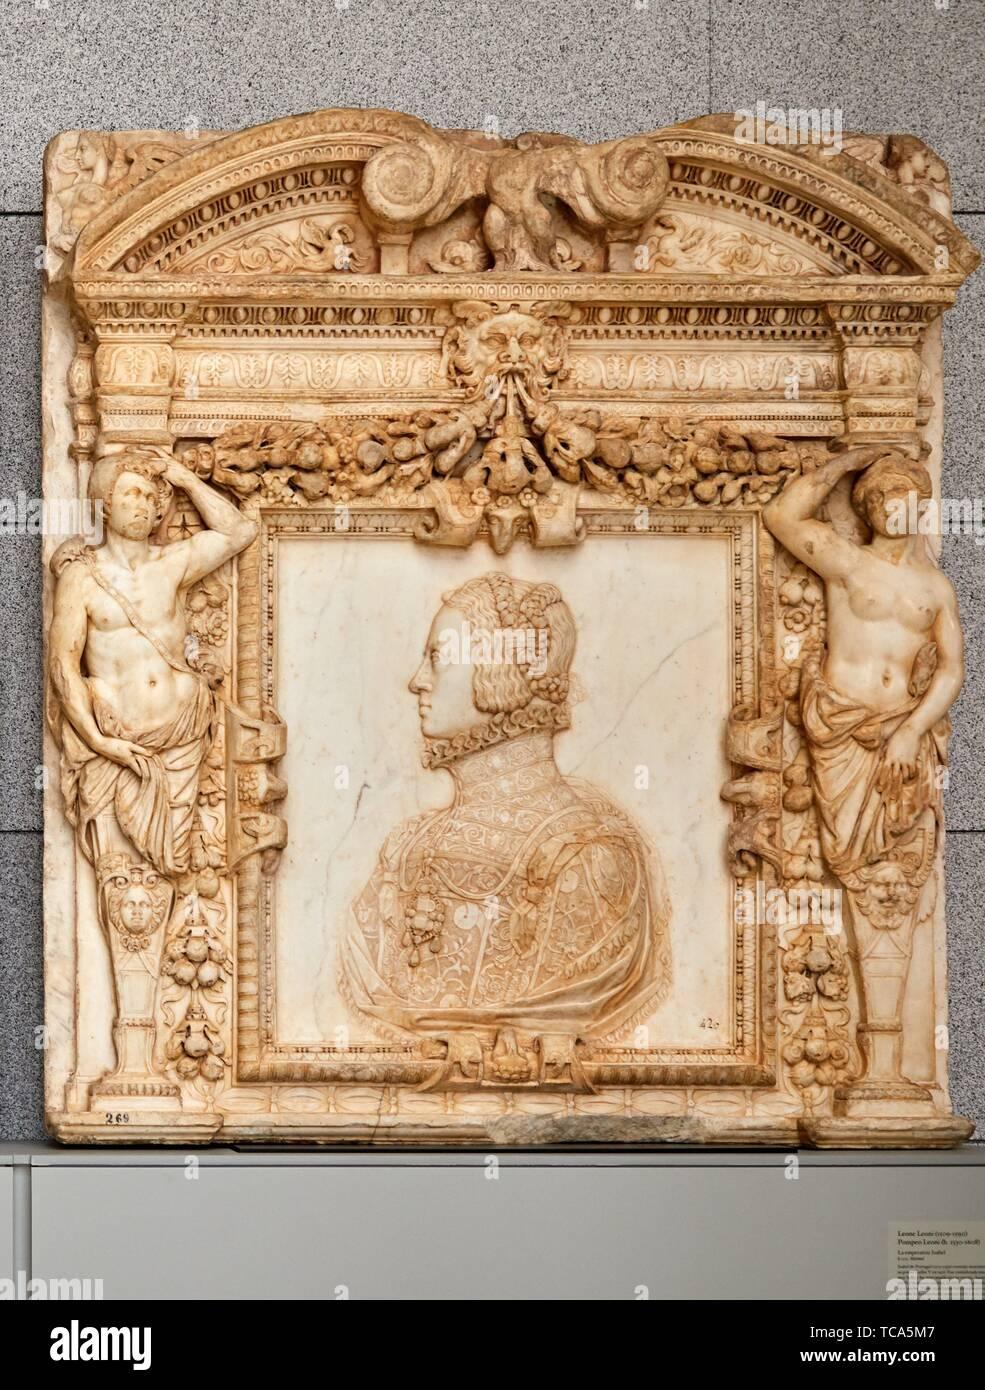 '''Empress Isabel'', 1555, Leone Leoni, Pompeo Leoni, Cloister Jerónimos Building, Prado Museum, Madrid, Spain, Europe - Stock Image